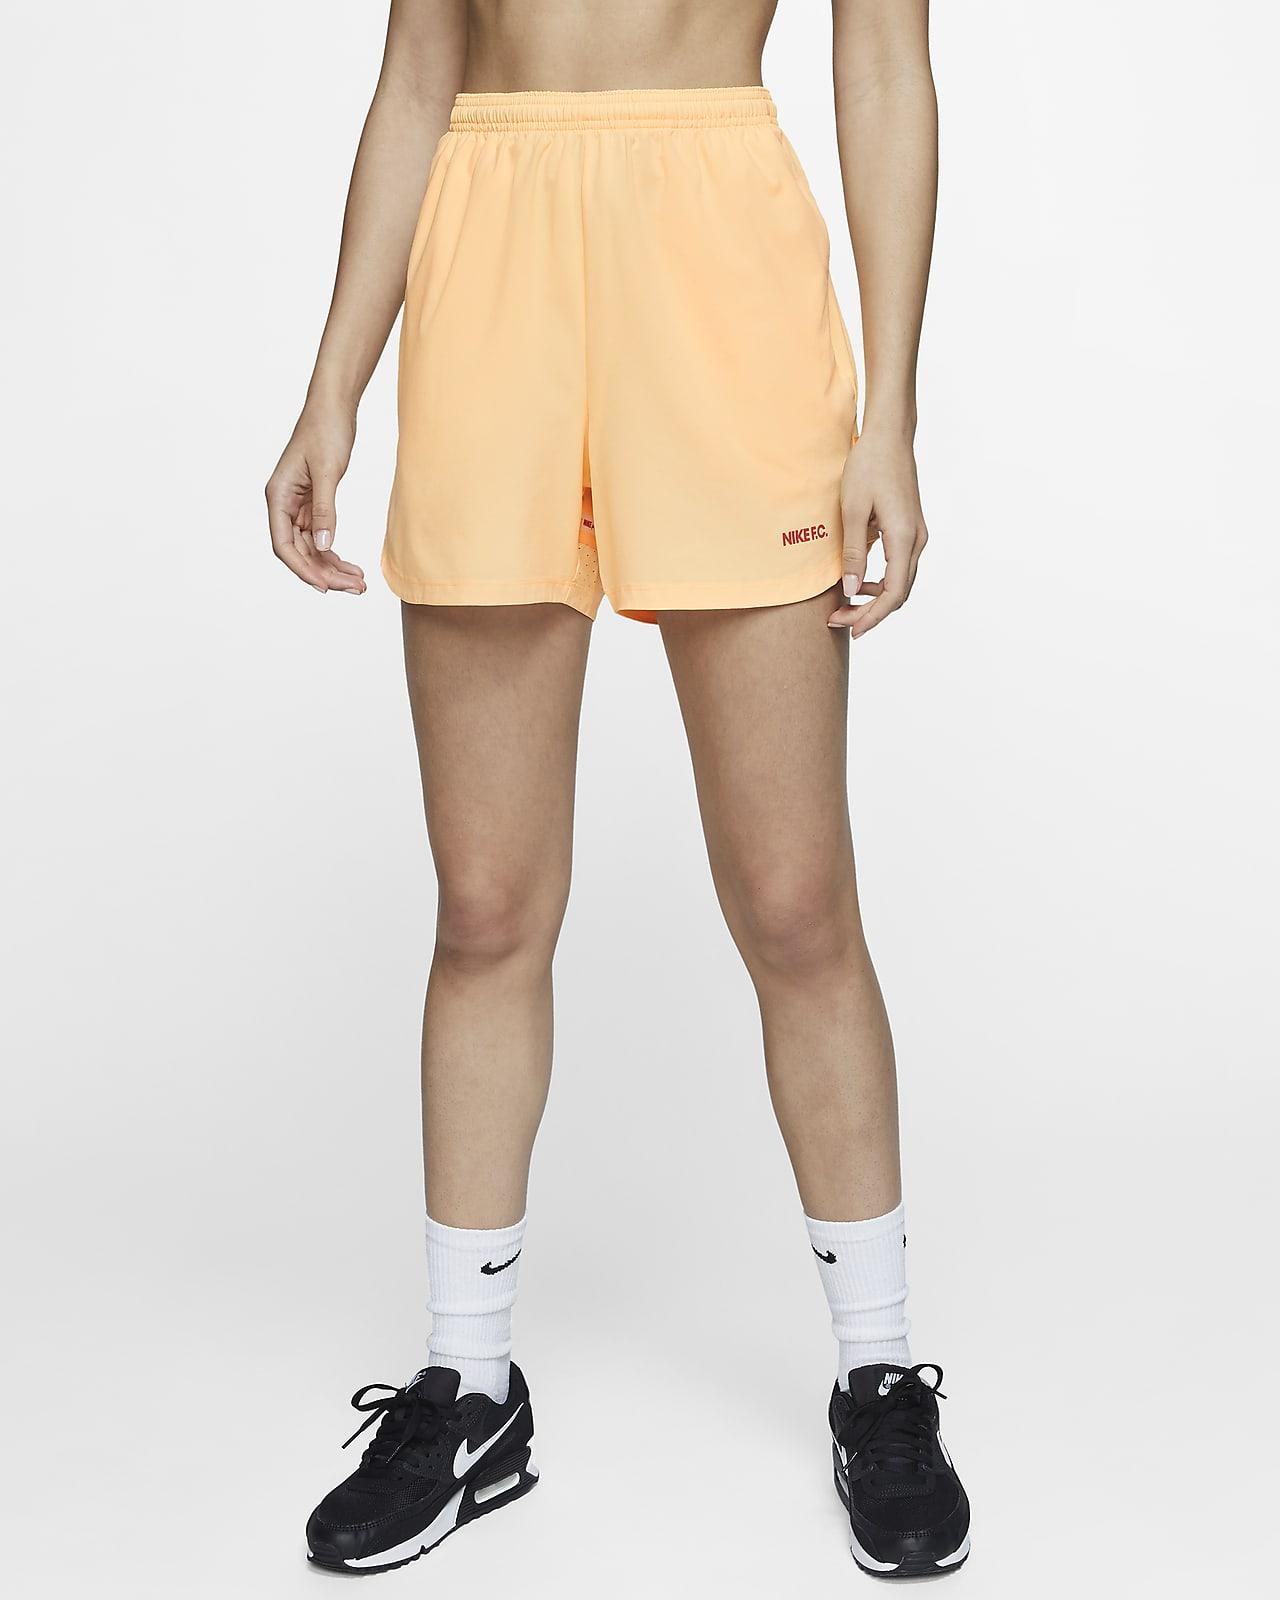 Nike F.C. Germany Women's Football Shorts